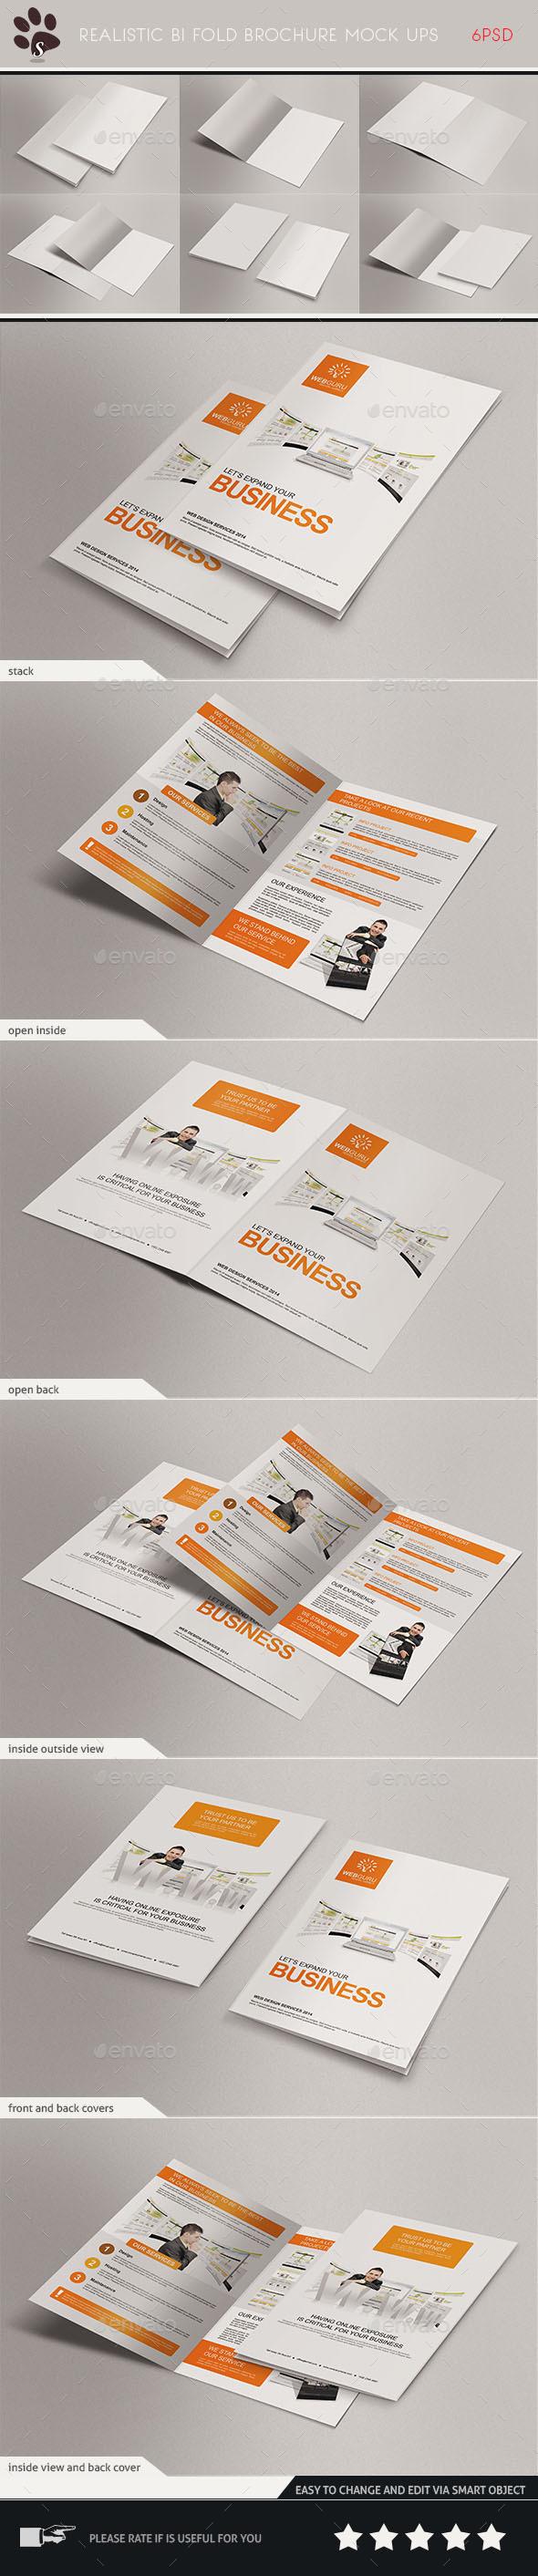 GraphicRiver Realistic Bi Fold Brochure Mock Ups 8872037